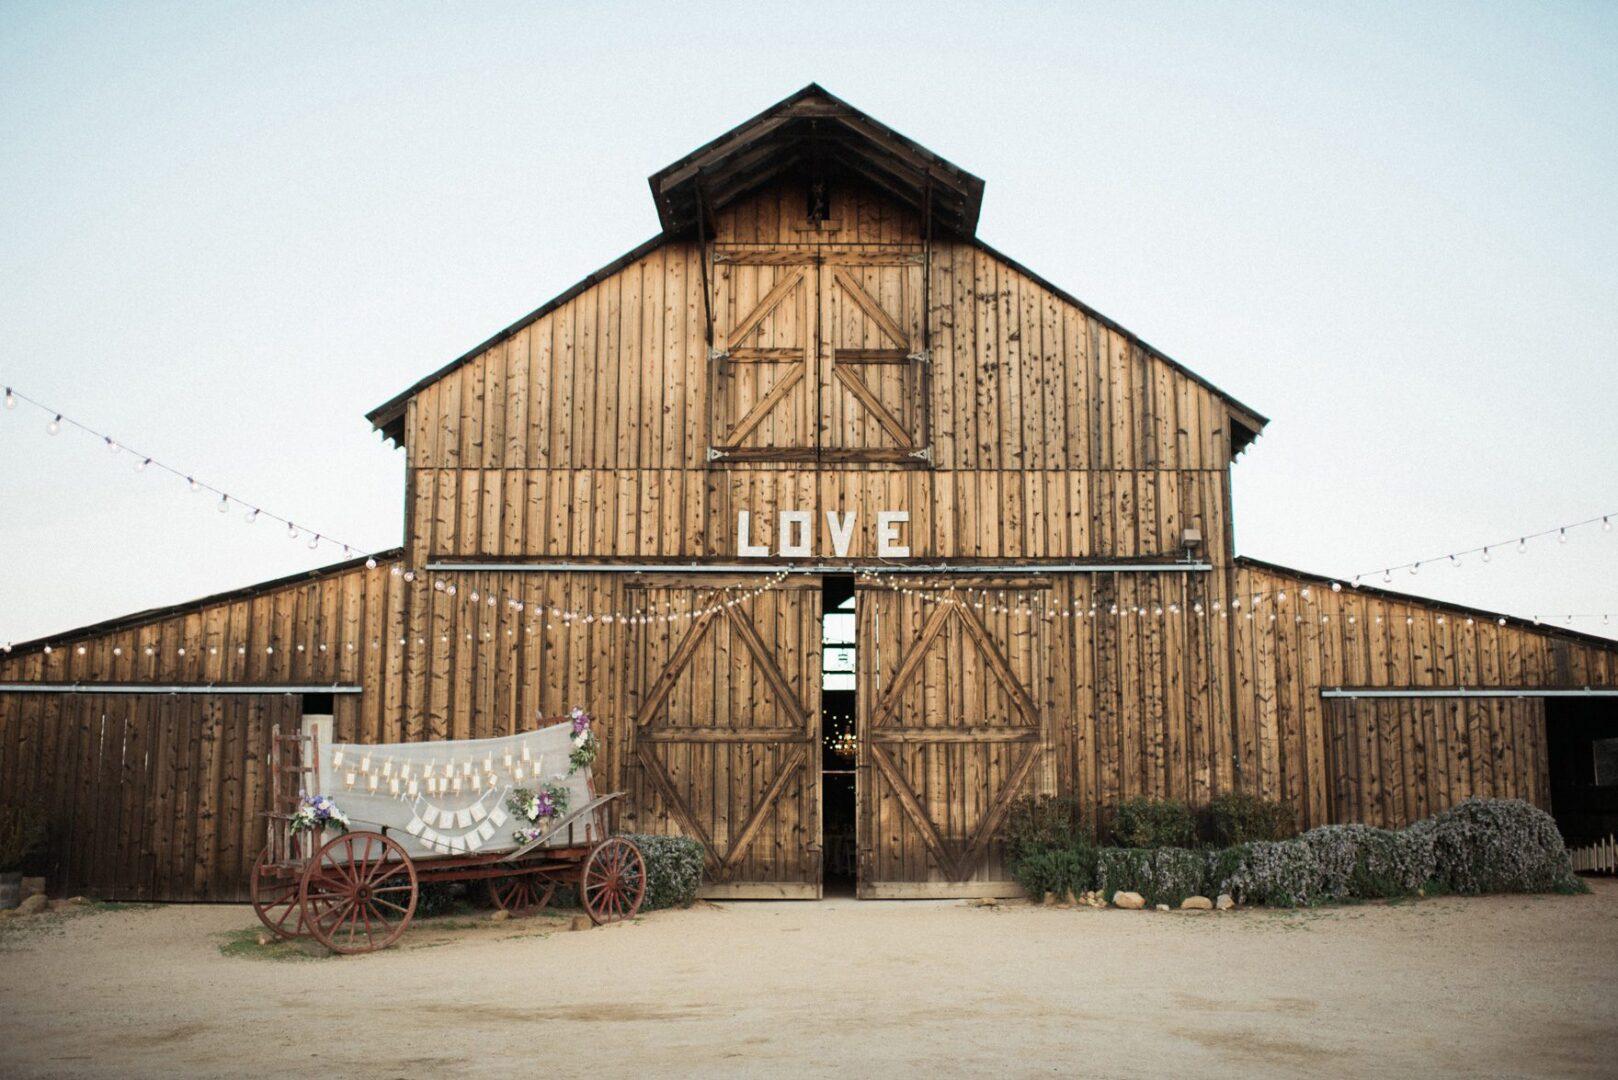 California-Santa-Margarita-Ranch-destination--Saint-Louis-Obispo-wedding-photographer-christina-lilly-photography071